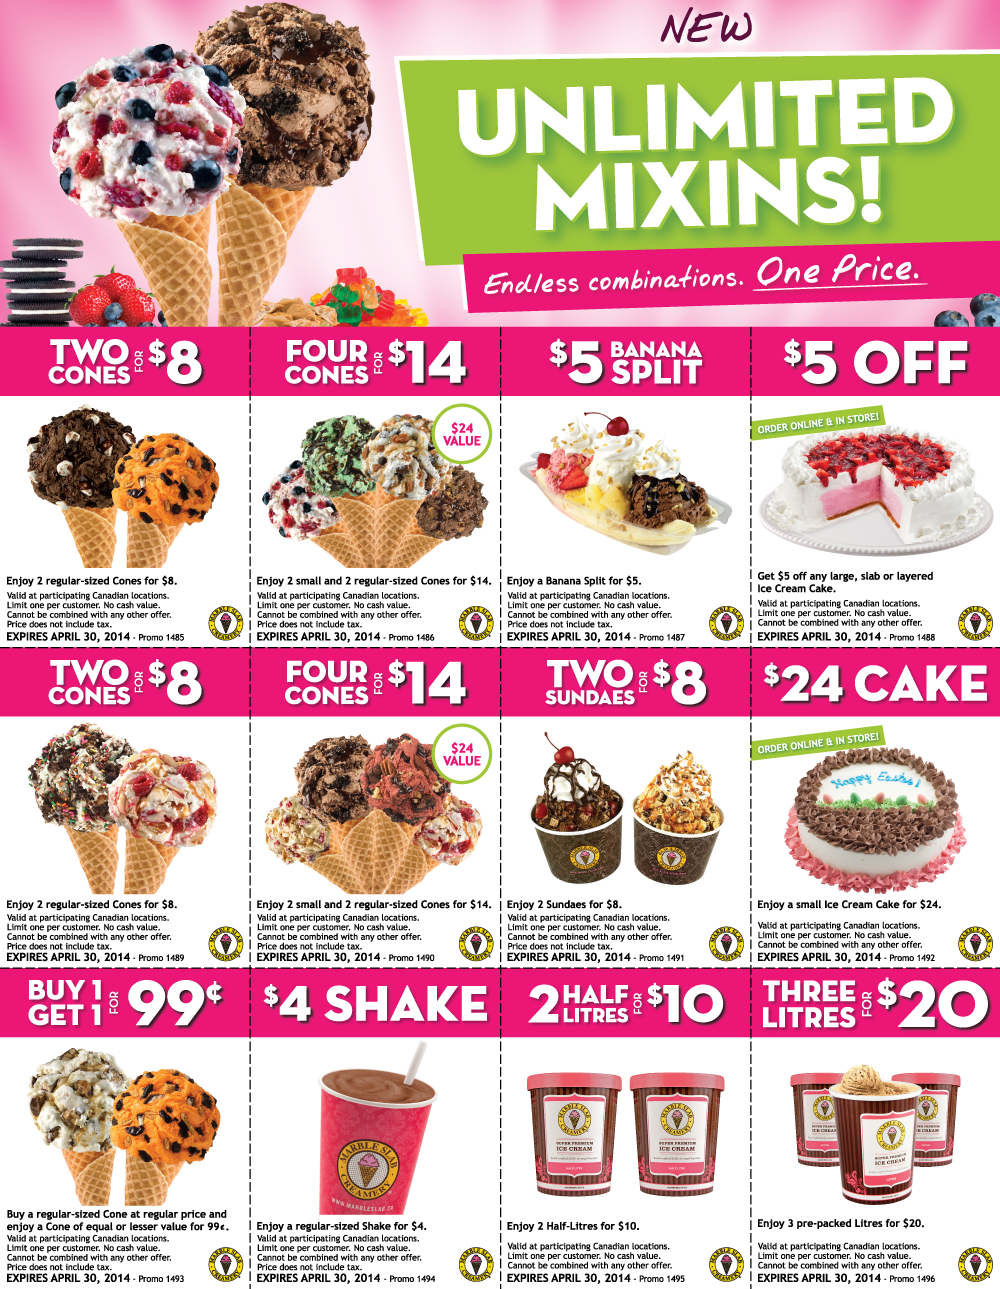 Marble Slab Creamery New Printable Coupons (Until Apr 30)